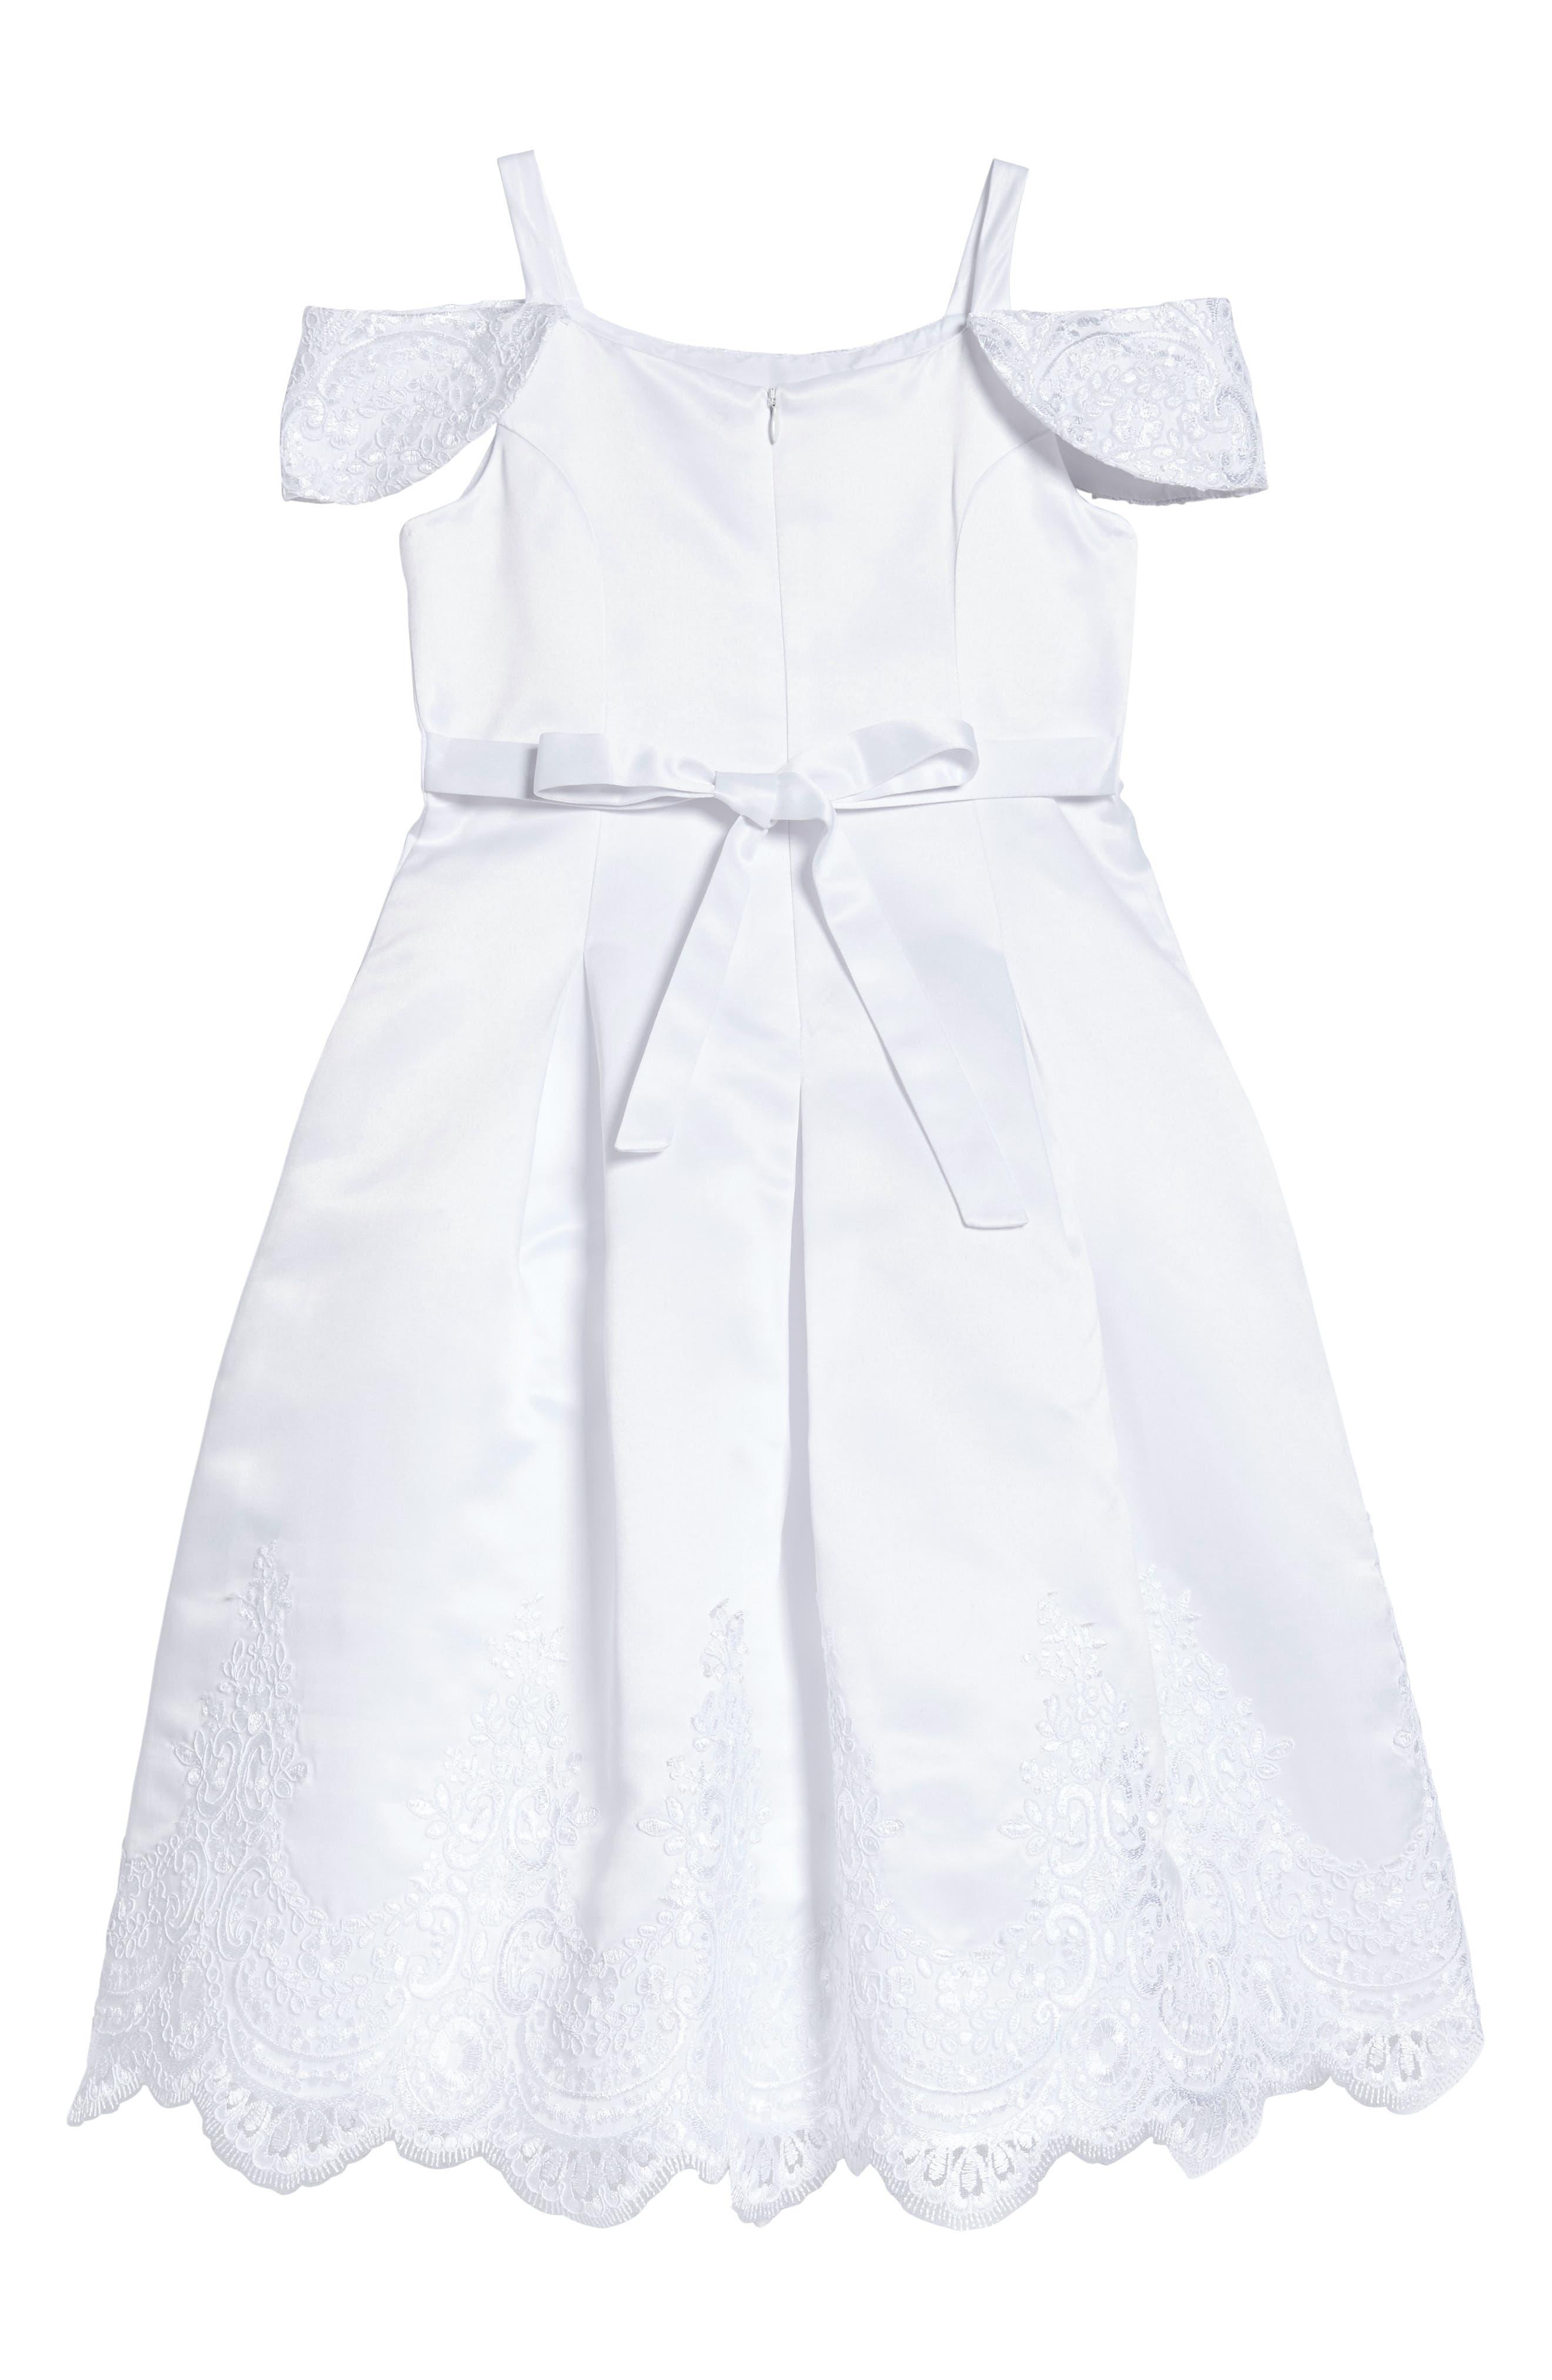 Embroidered Satin Dress,                             Alternate thumbnail 2, color,                             White